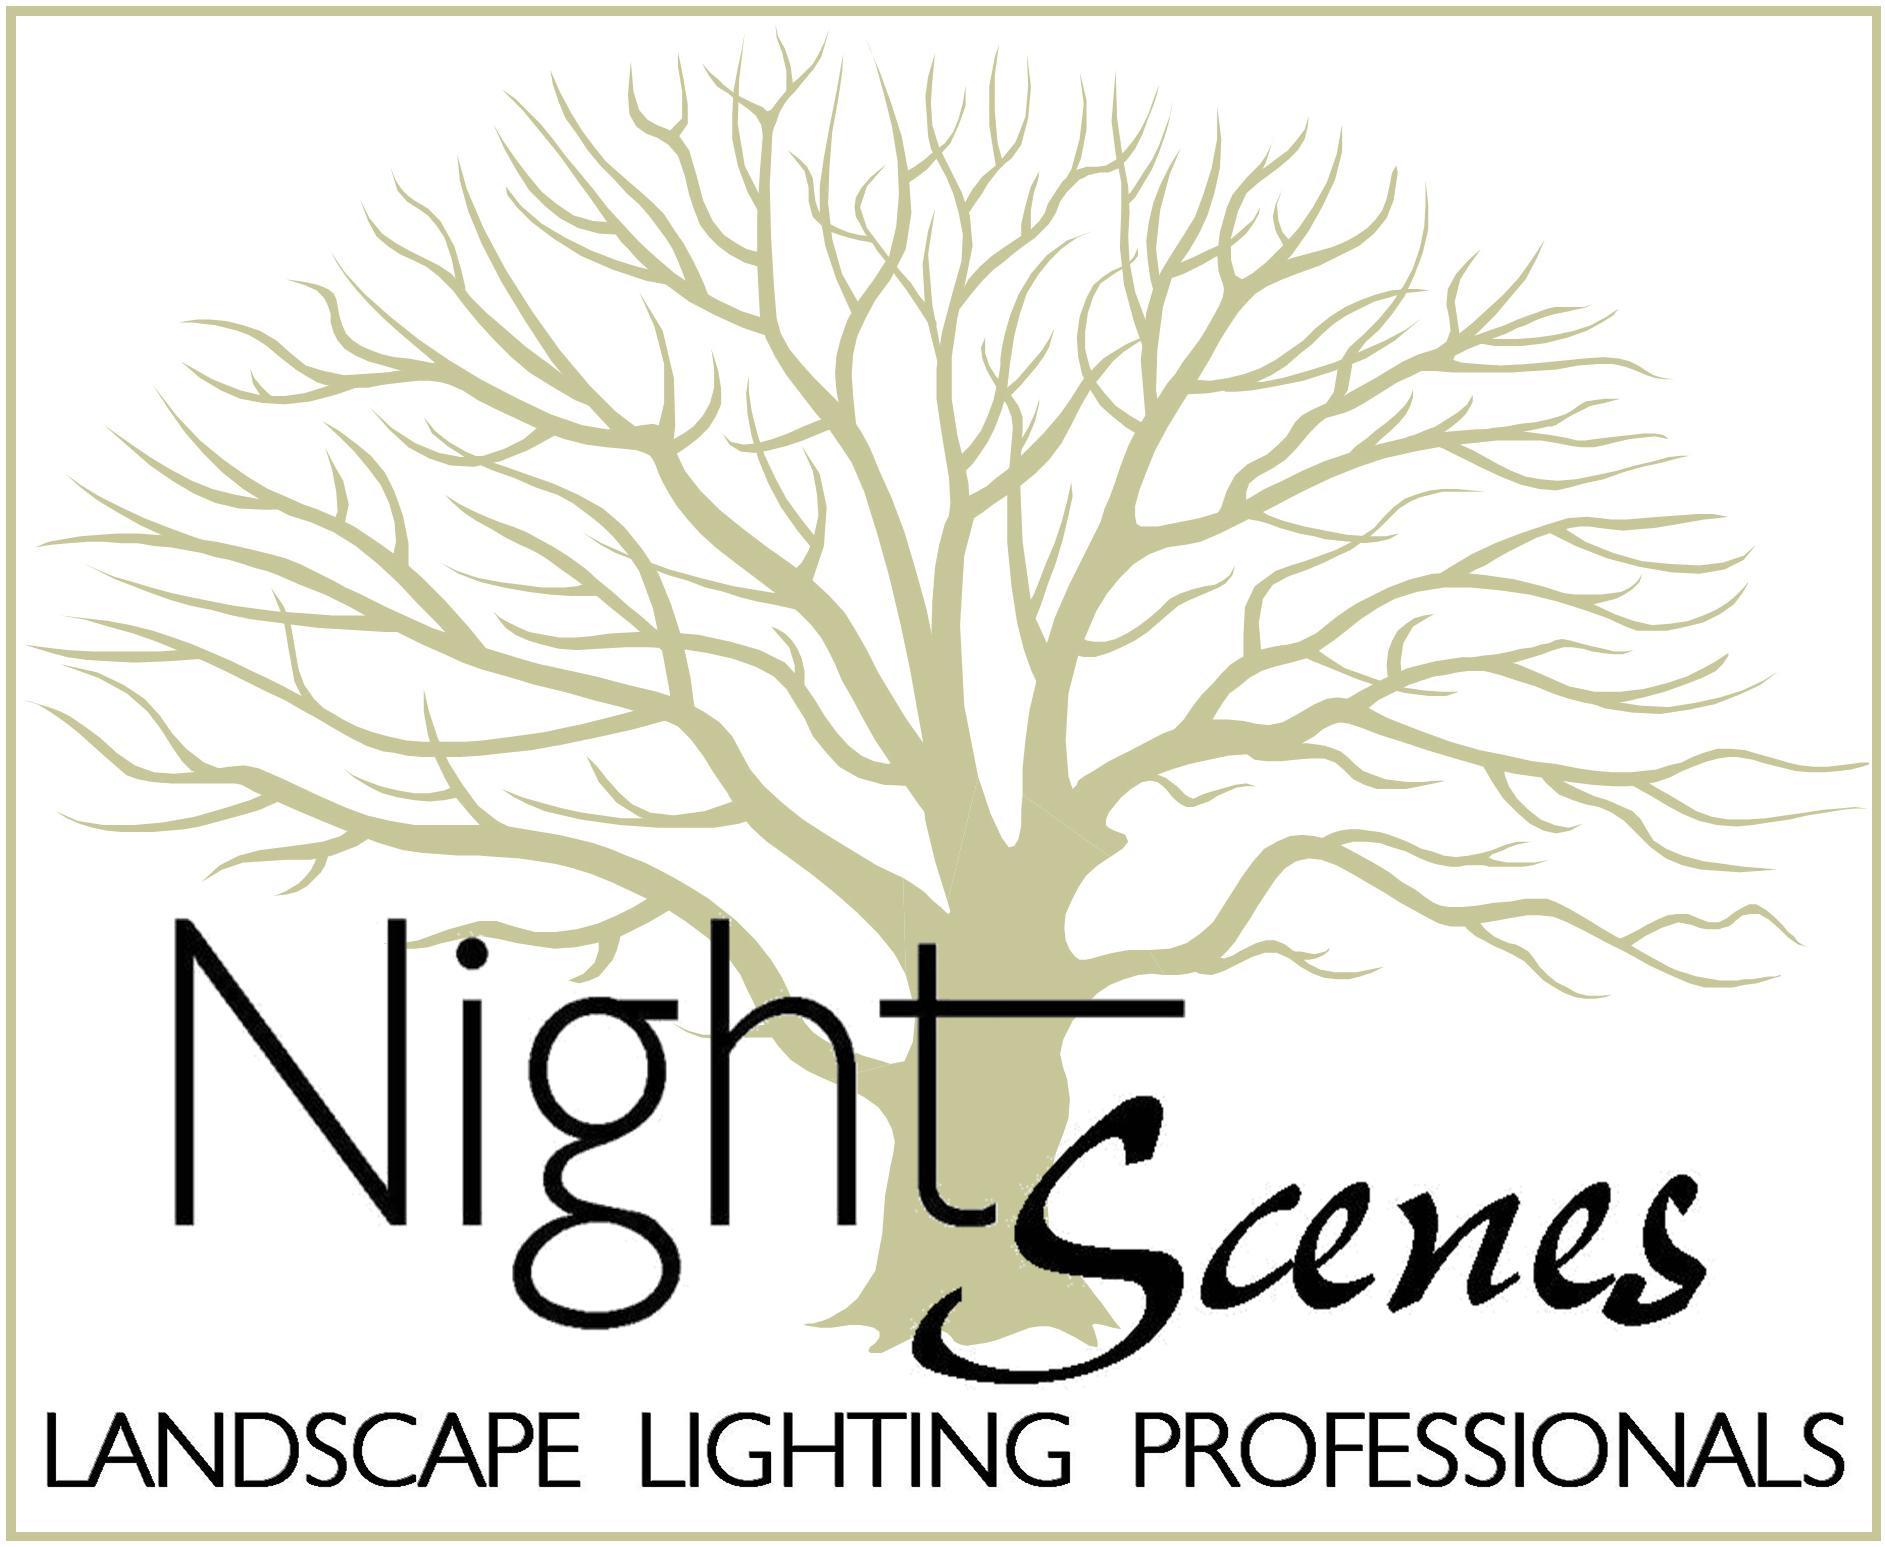 Nightscapes Landscape Lighting Nightscenes